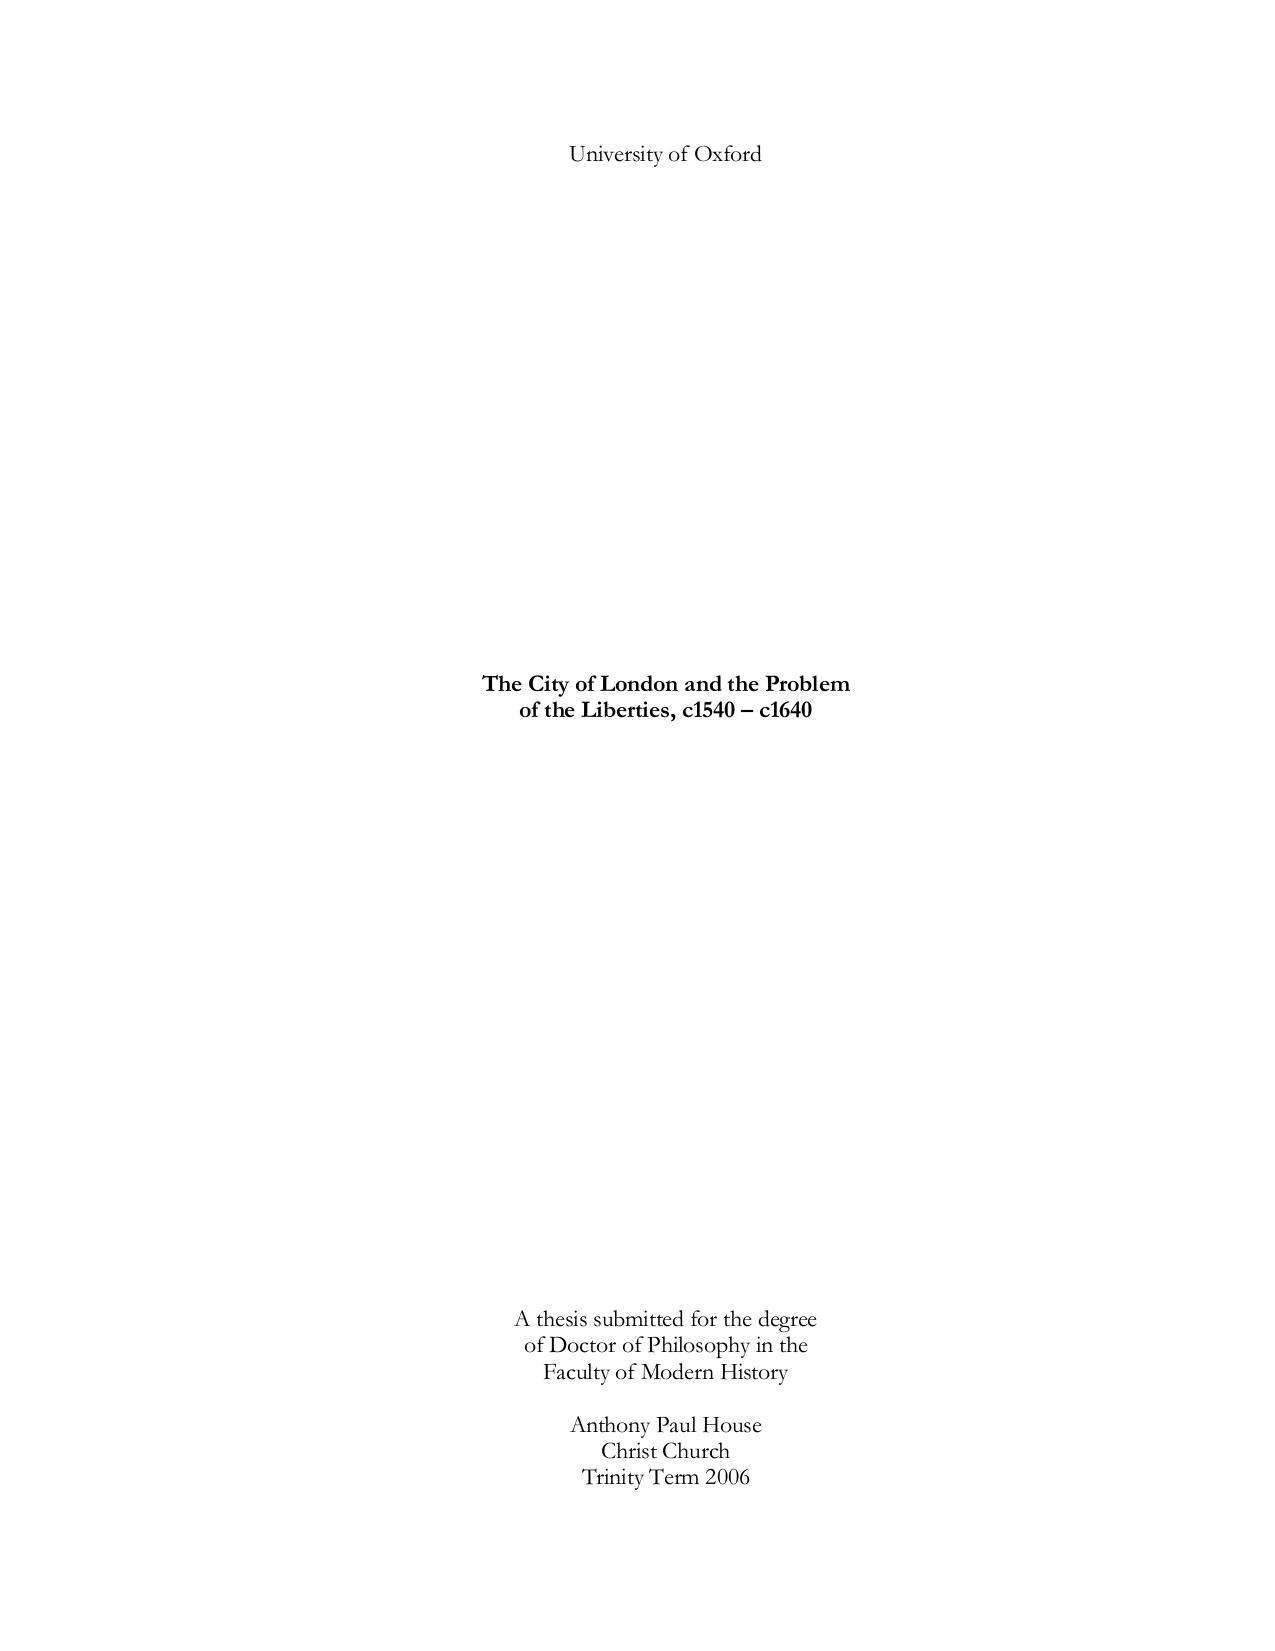 pdf for Lance-Larkin Coffee Maker Brew Express BE-104R manual